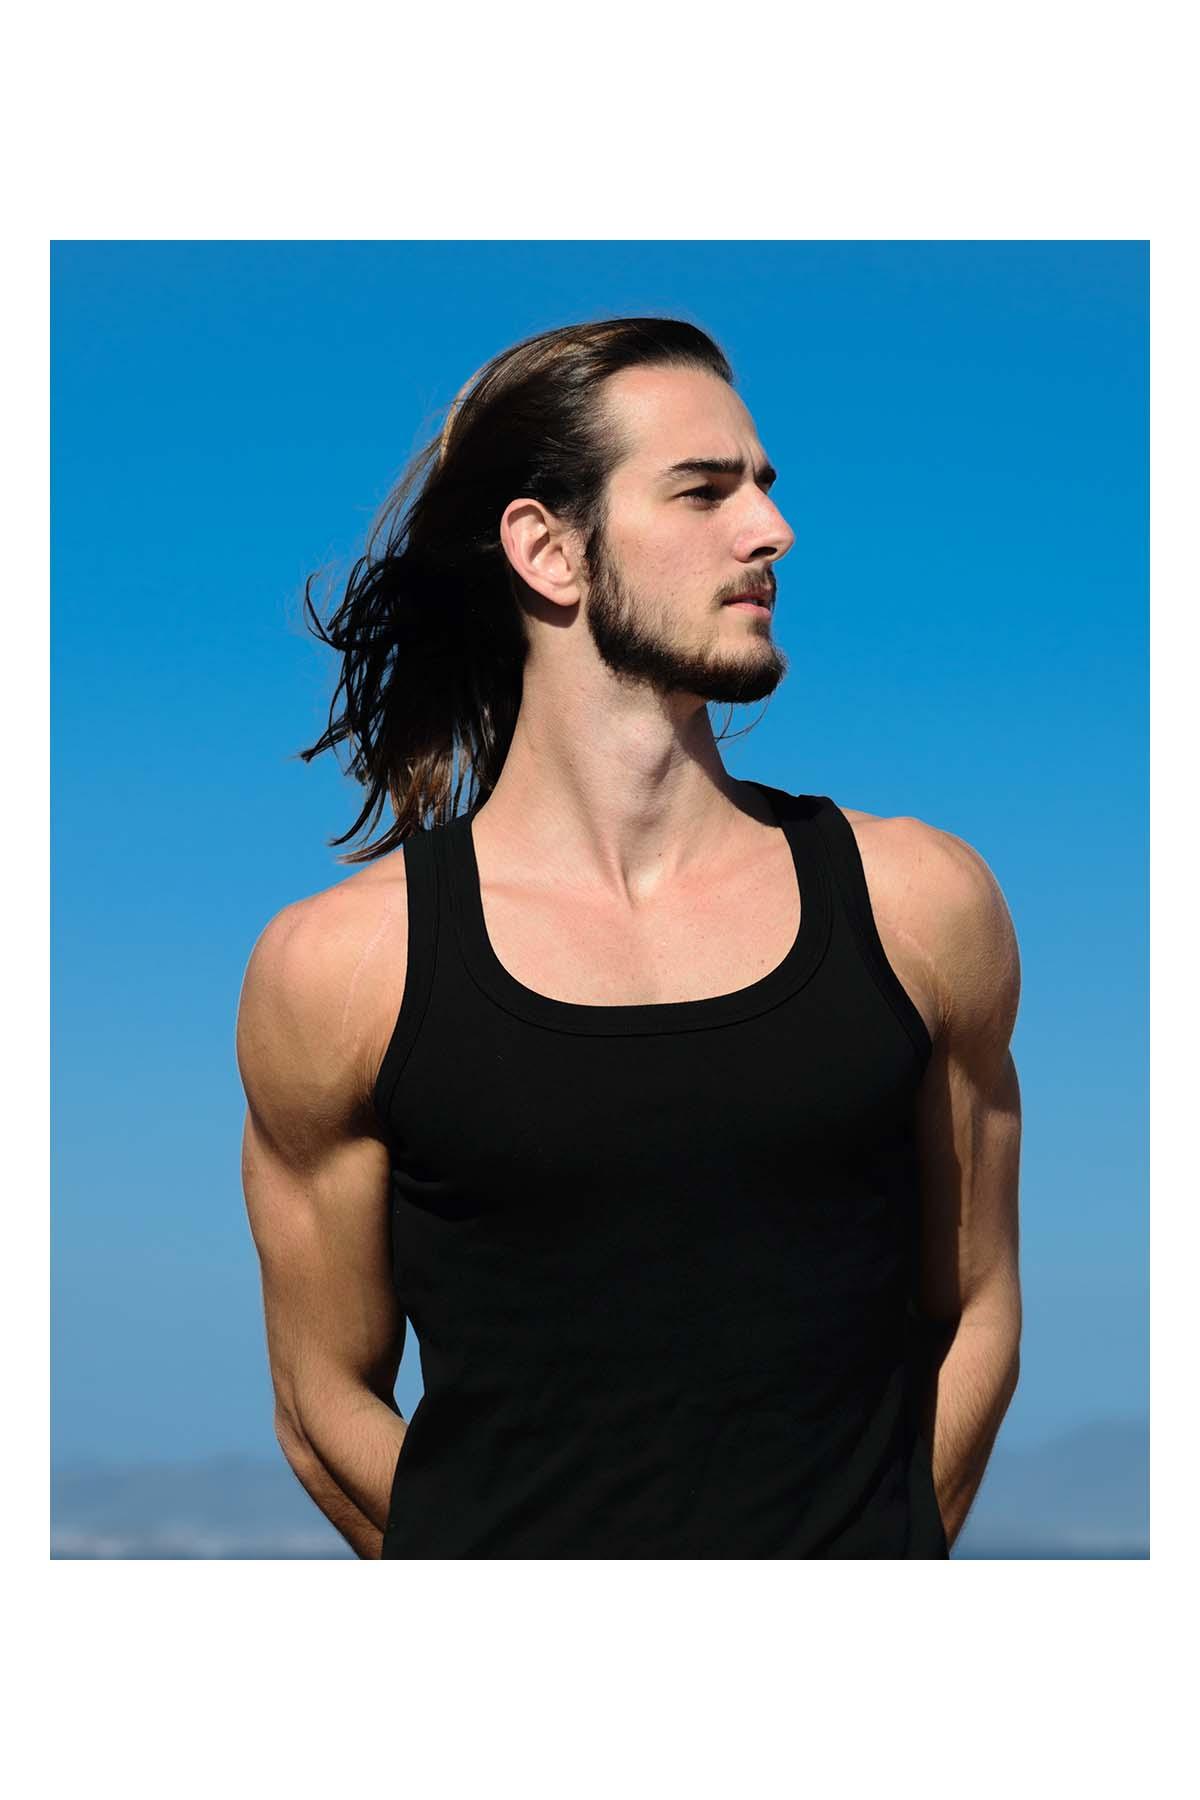 Daniel Neves by Beto Urbano for Brazilian Male Model